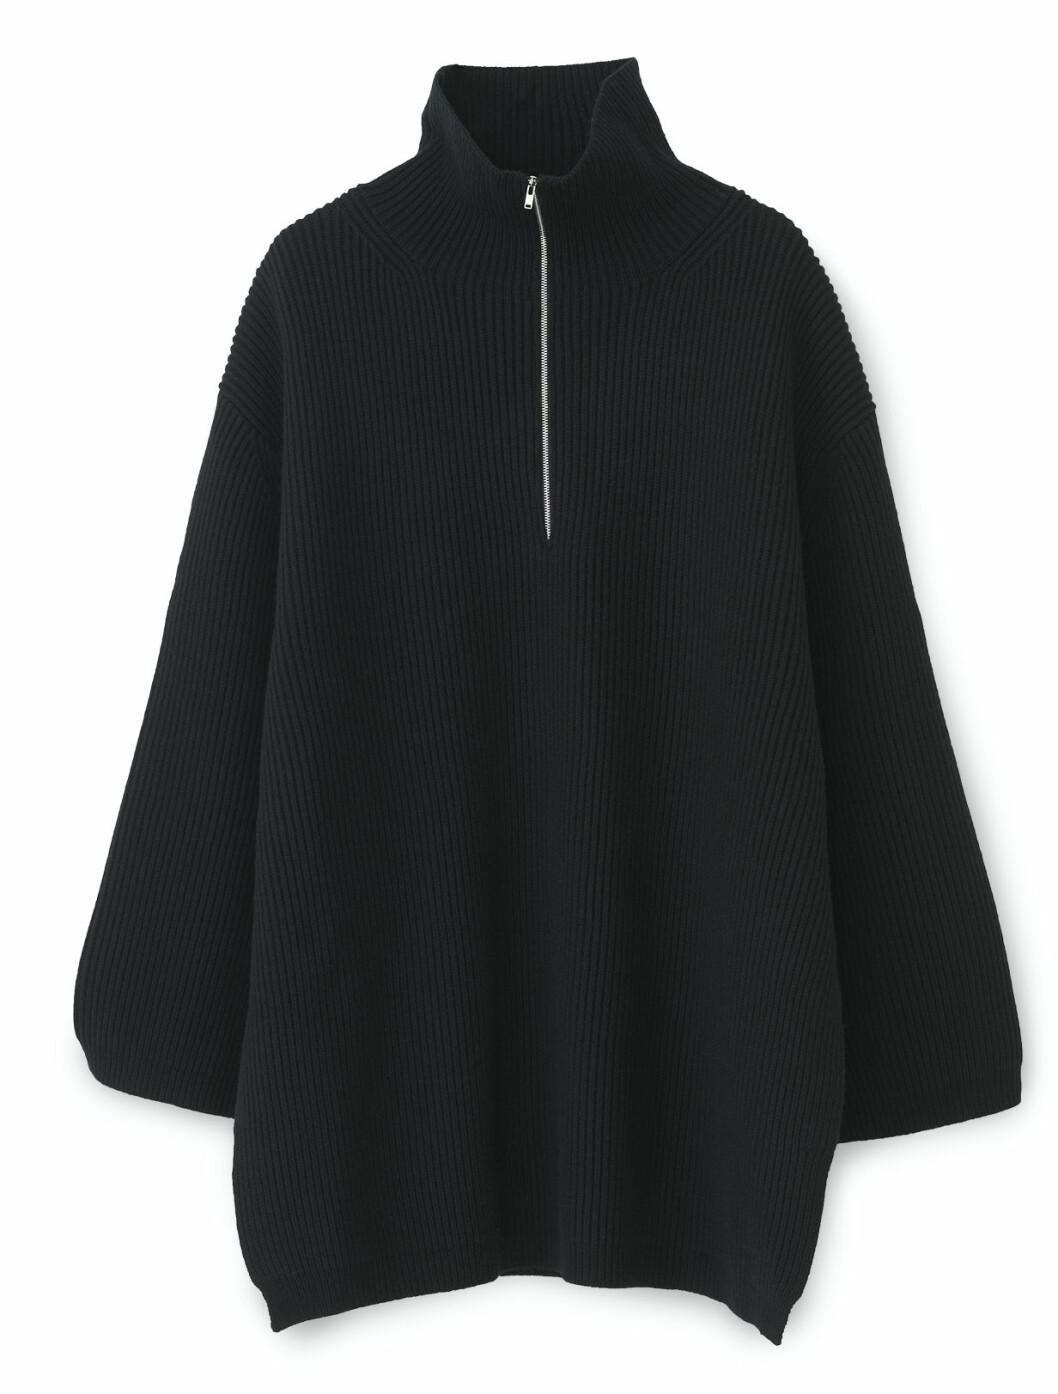 Oversized tröja i svart från Totême.